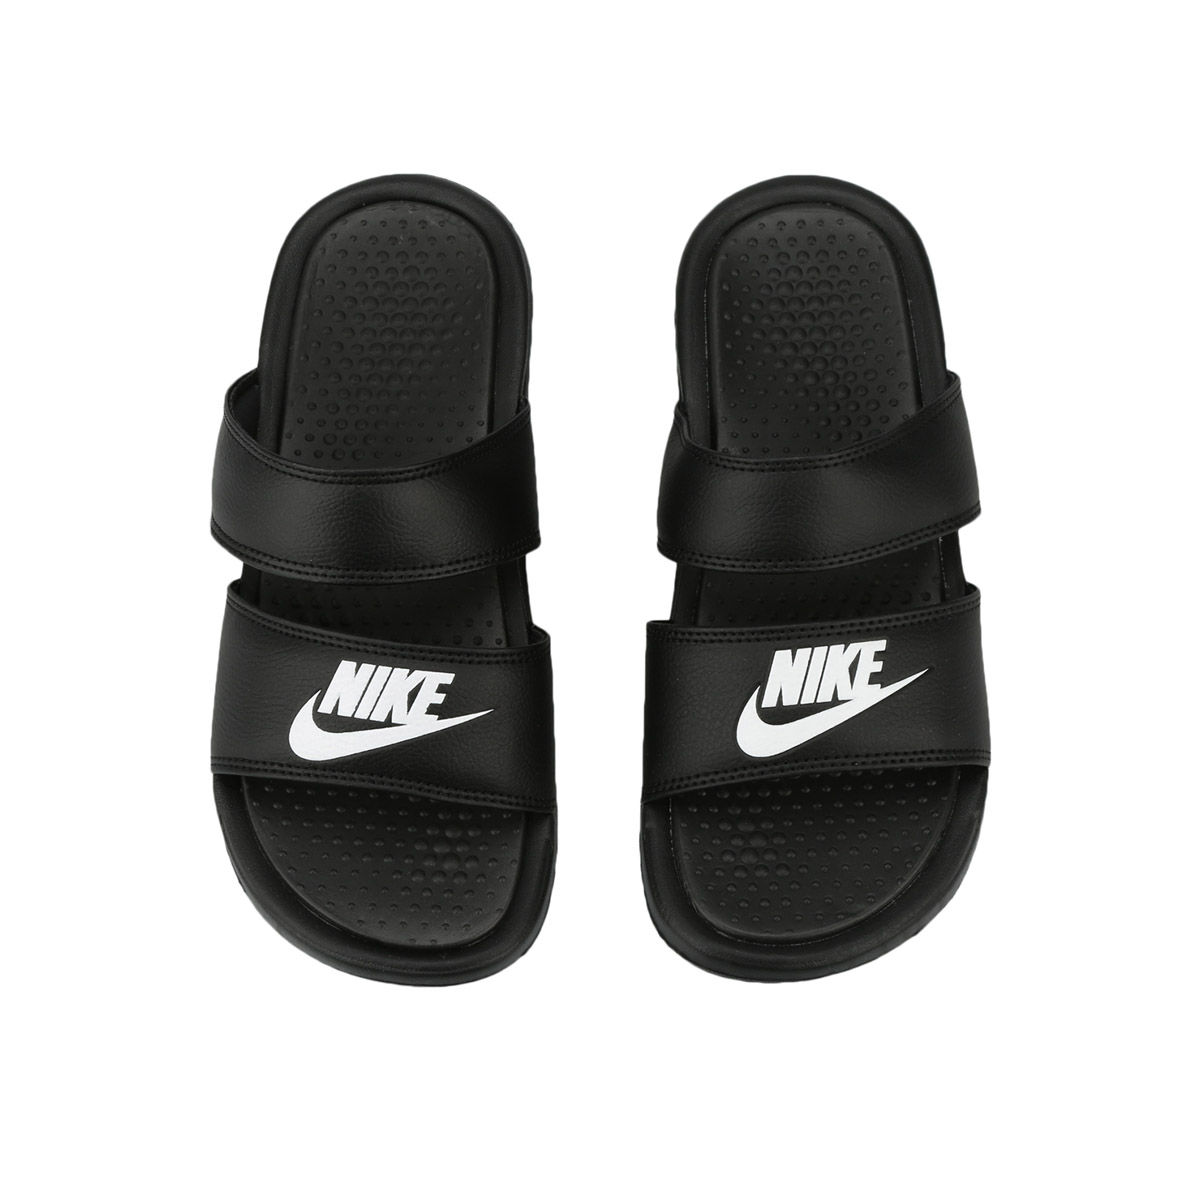 Perth Blackborough junio Oxidar  Sandalias Nike Benassi | Moov